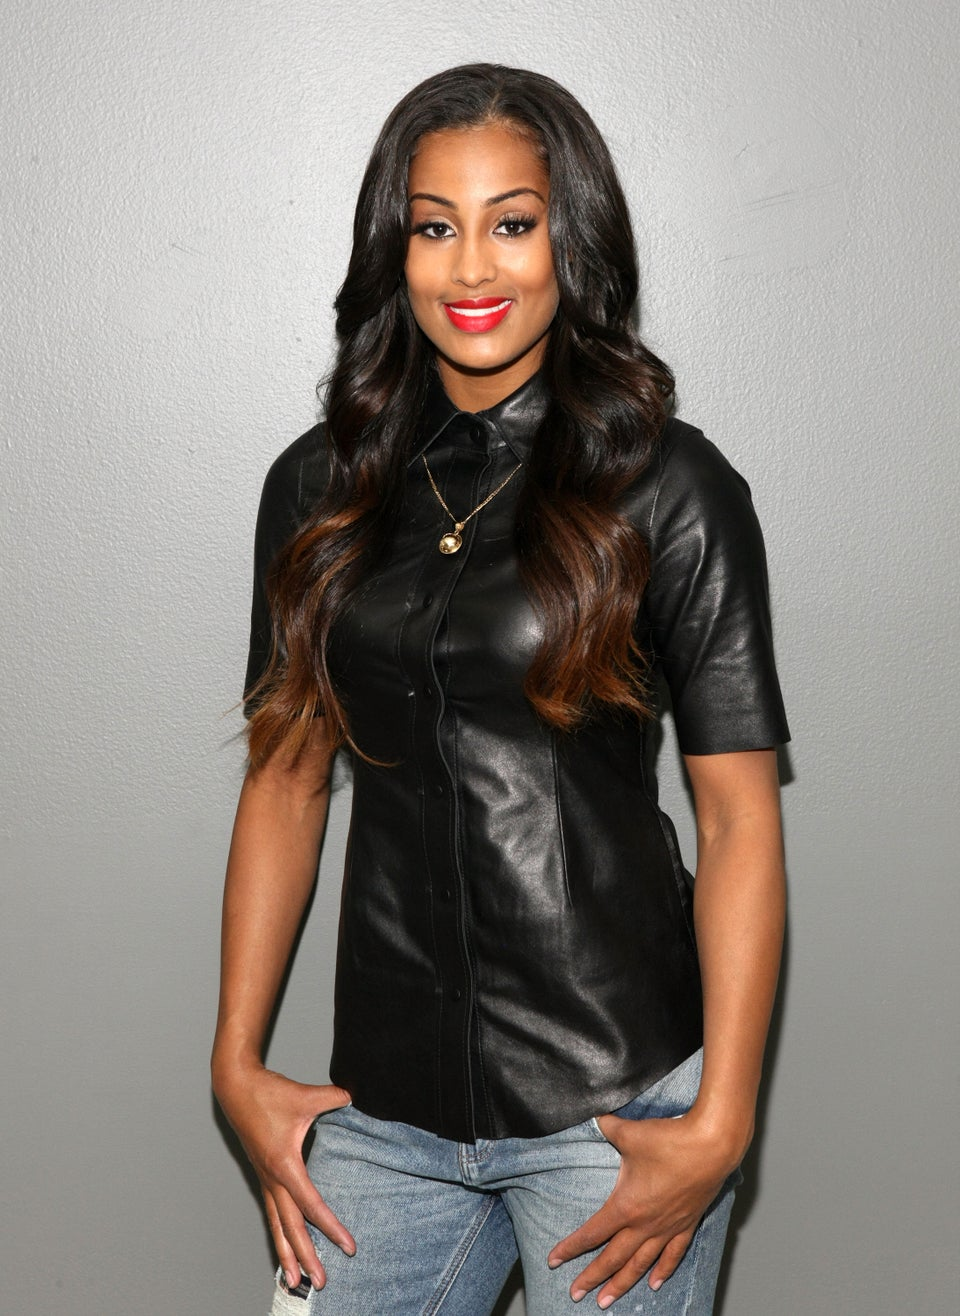 WNBA Star Skylar Diggins Spotlights Young Star Athletes on 'Little Ballers Indiana'